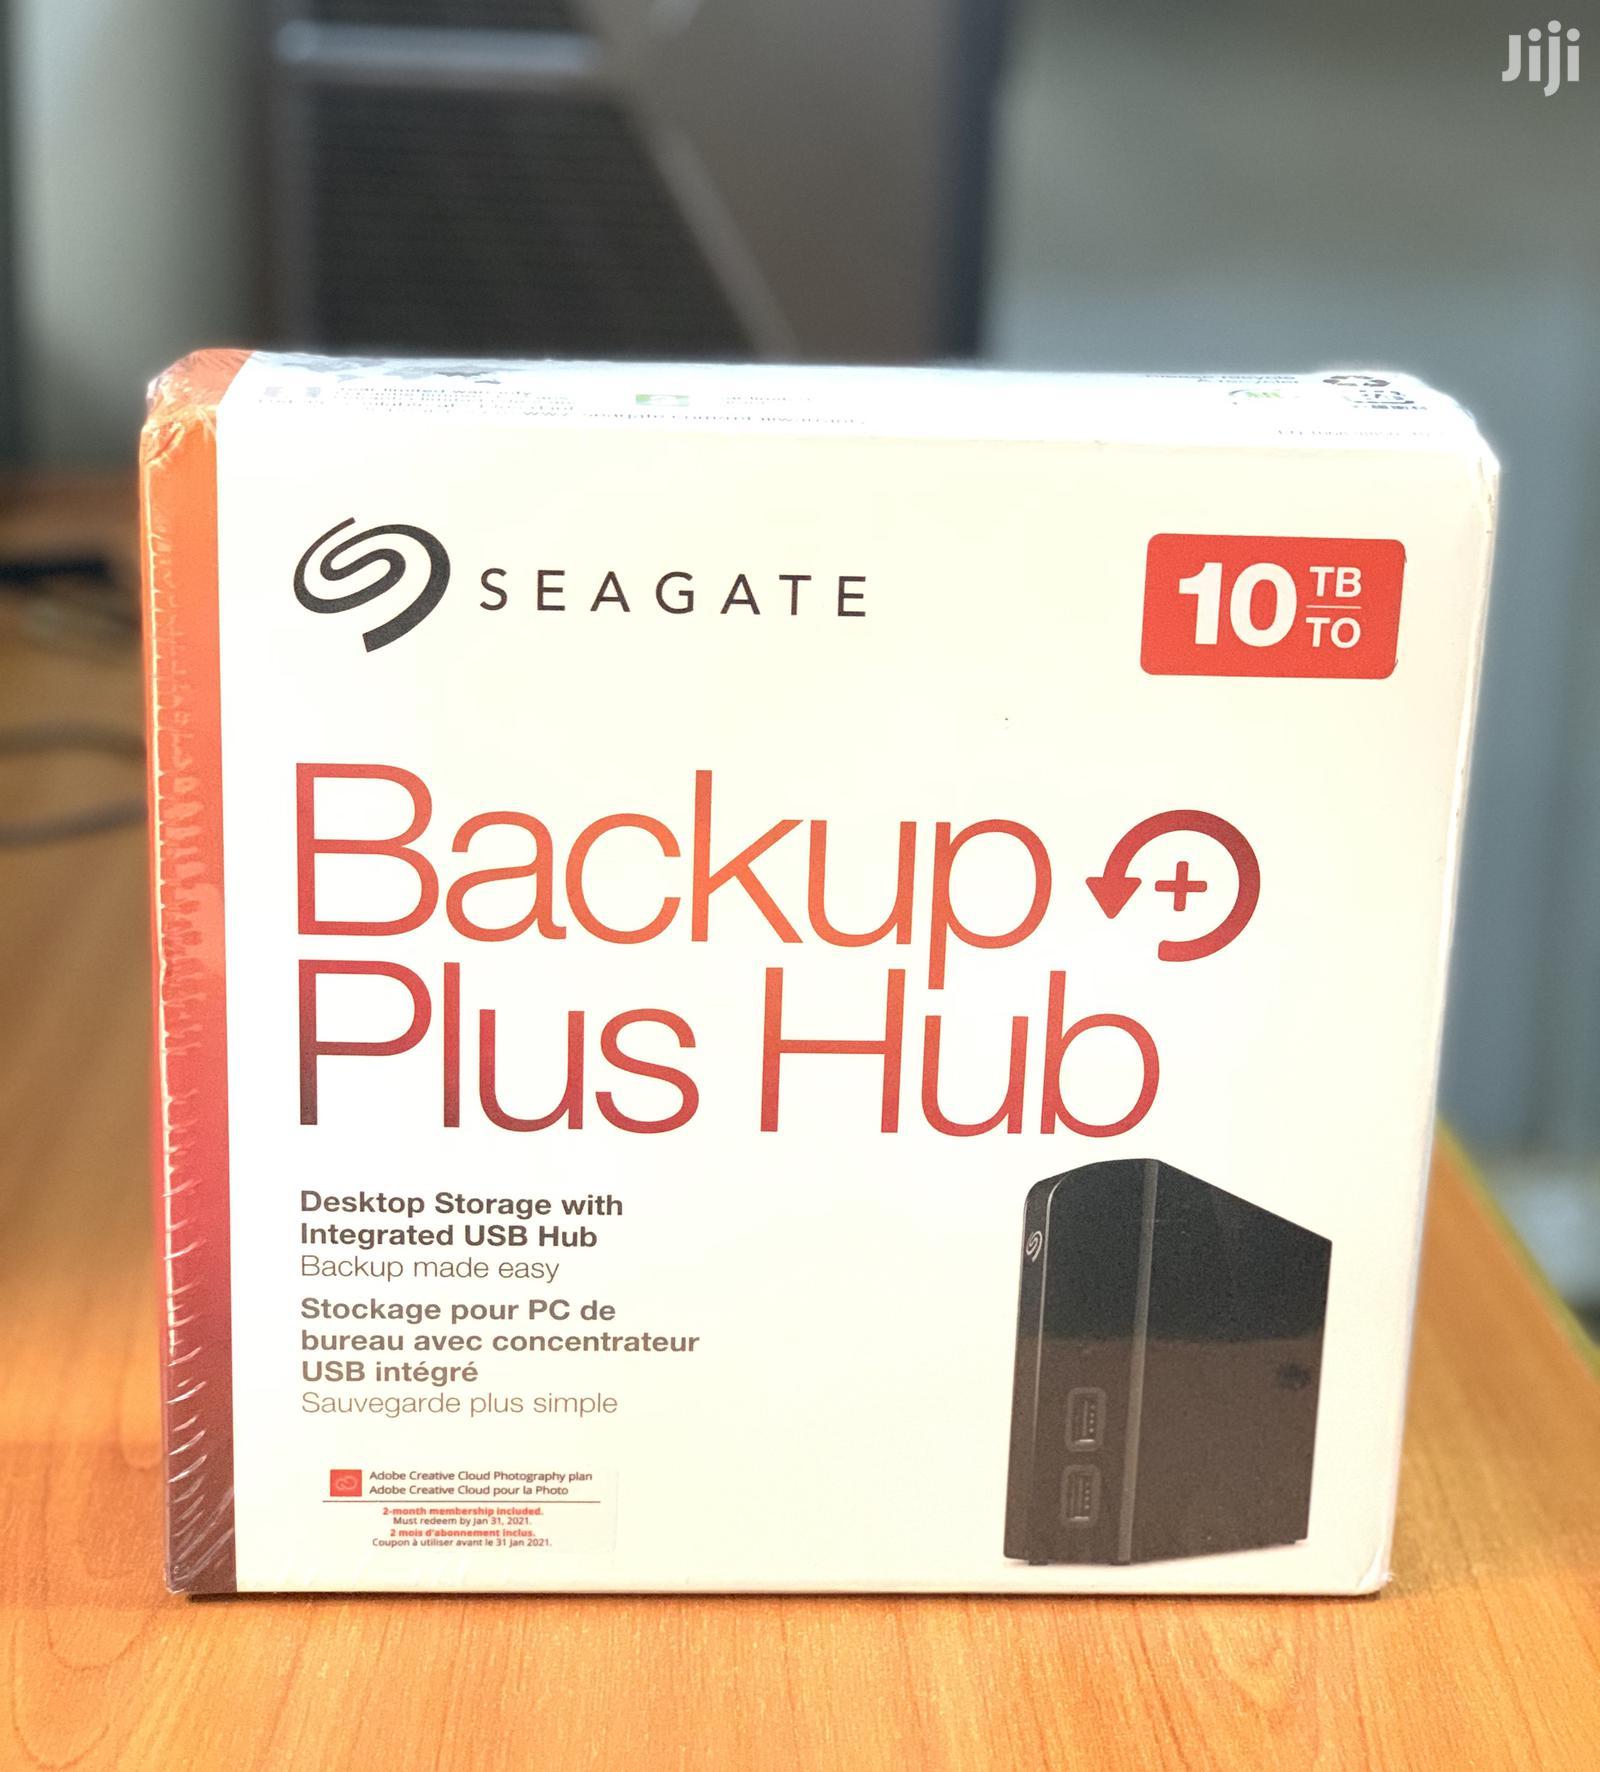 Seagate 10TB Backup Plus Hub